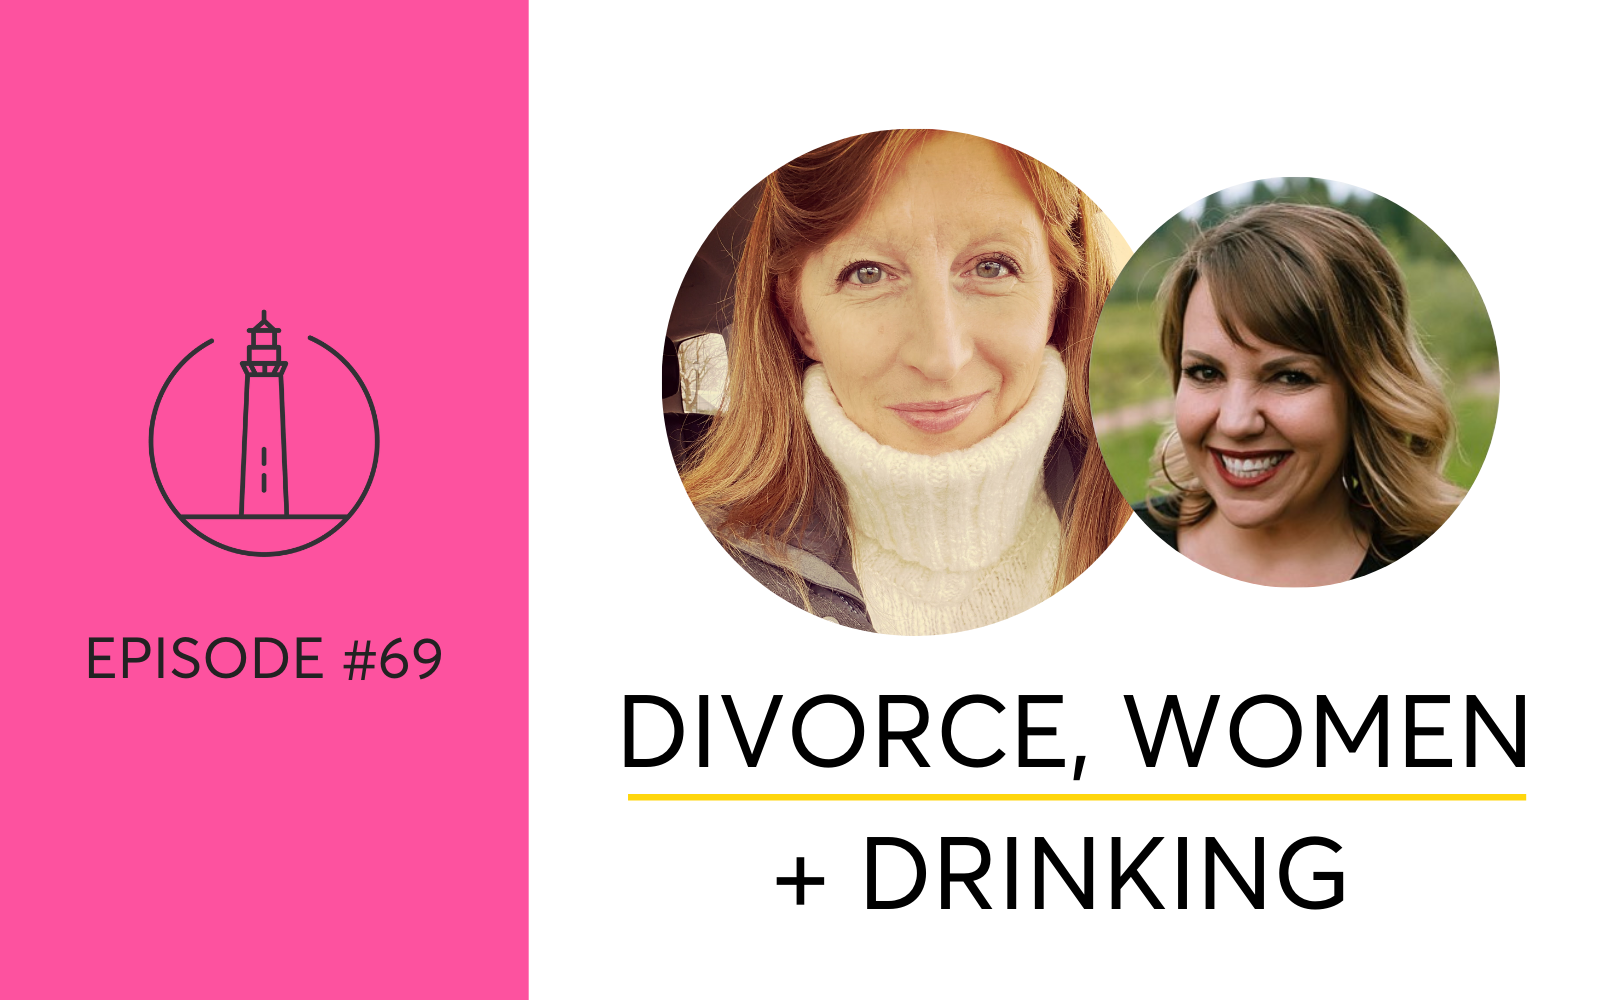 Divorce, Women and Drinking